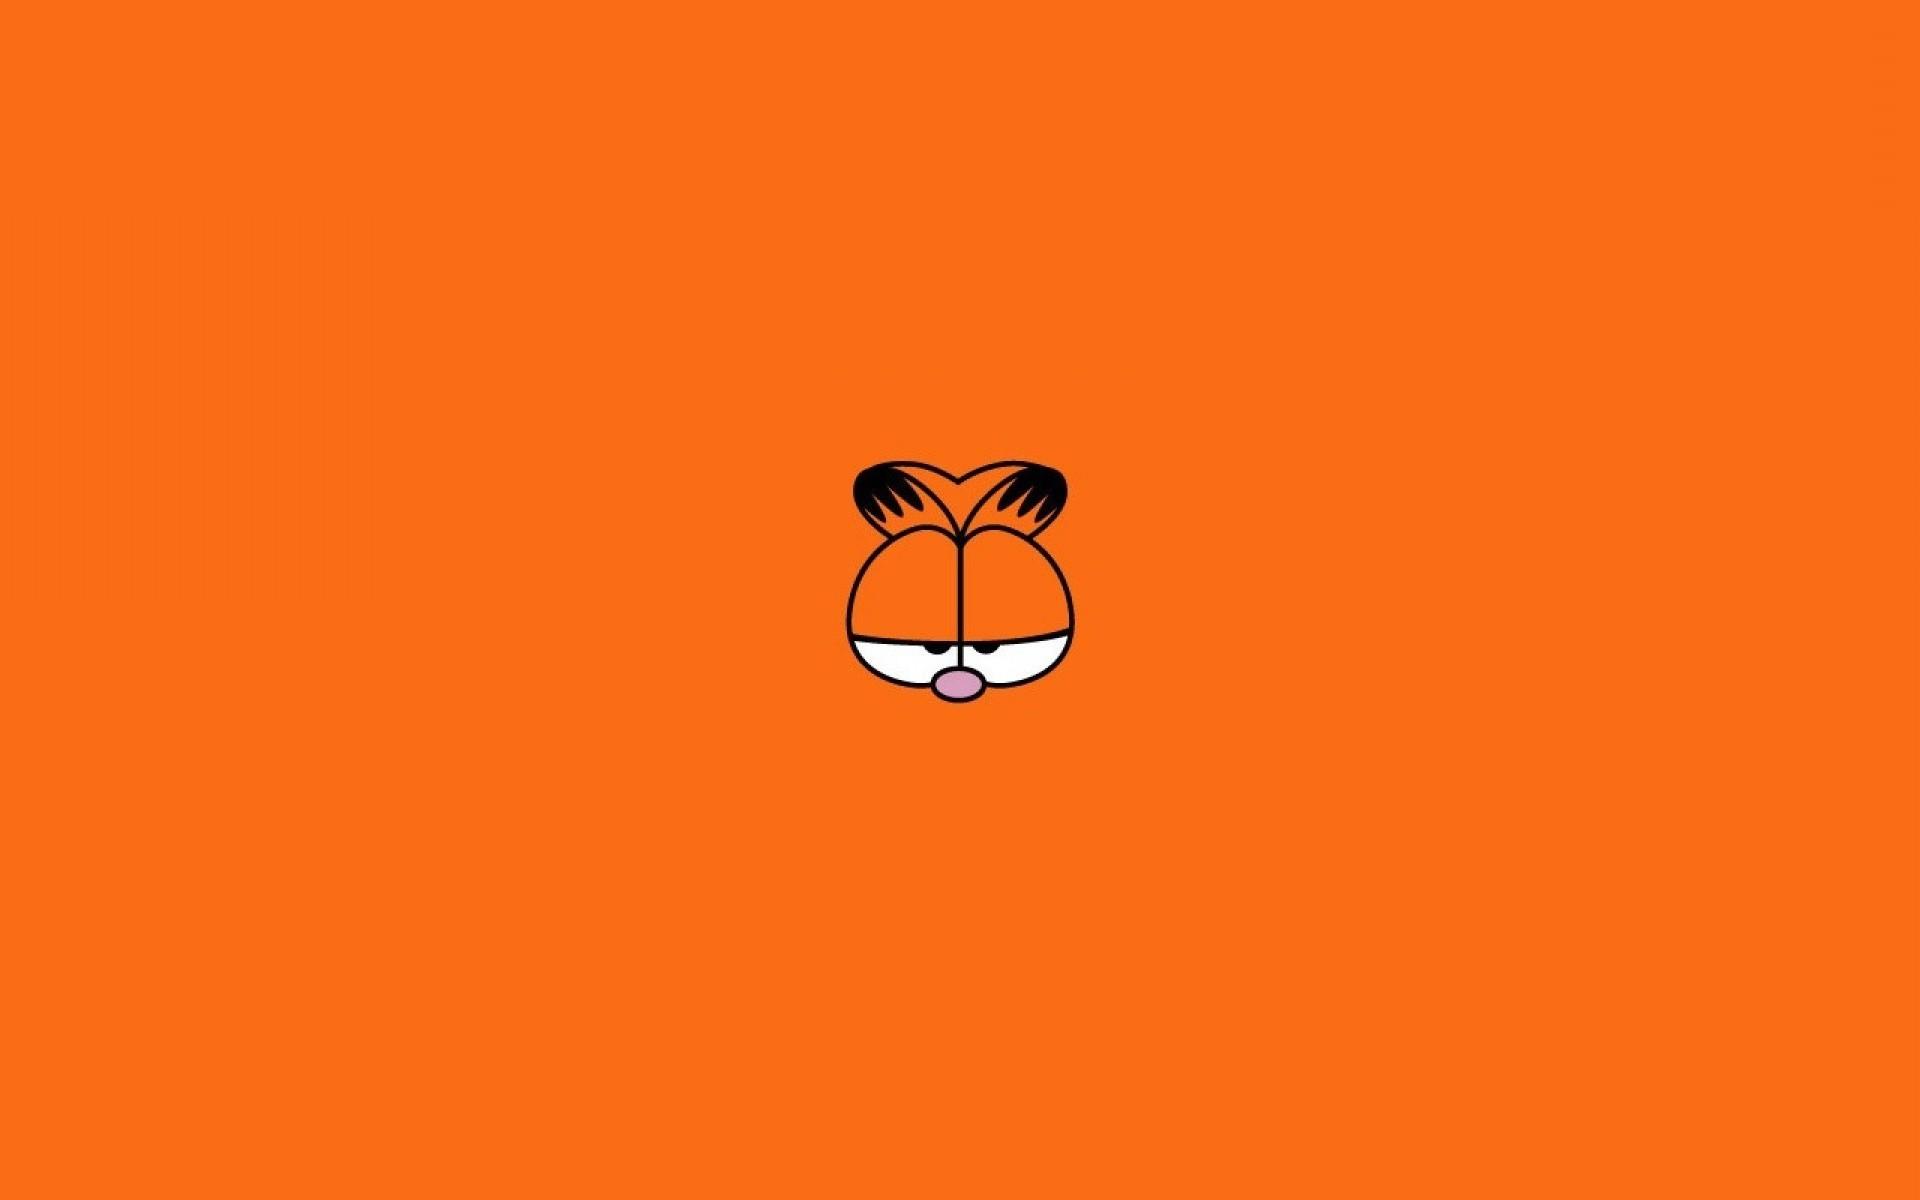 Cute Cat Wallpaper For Mobile Eyes Garfield Minimalism Cat Orange Wallpapers Hd